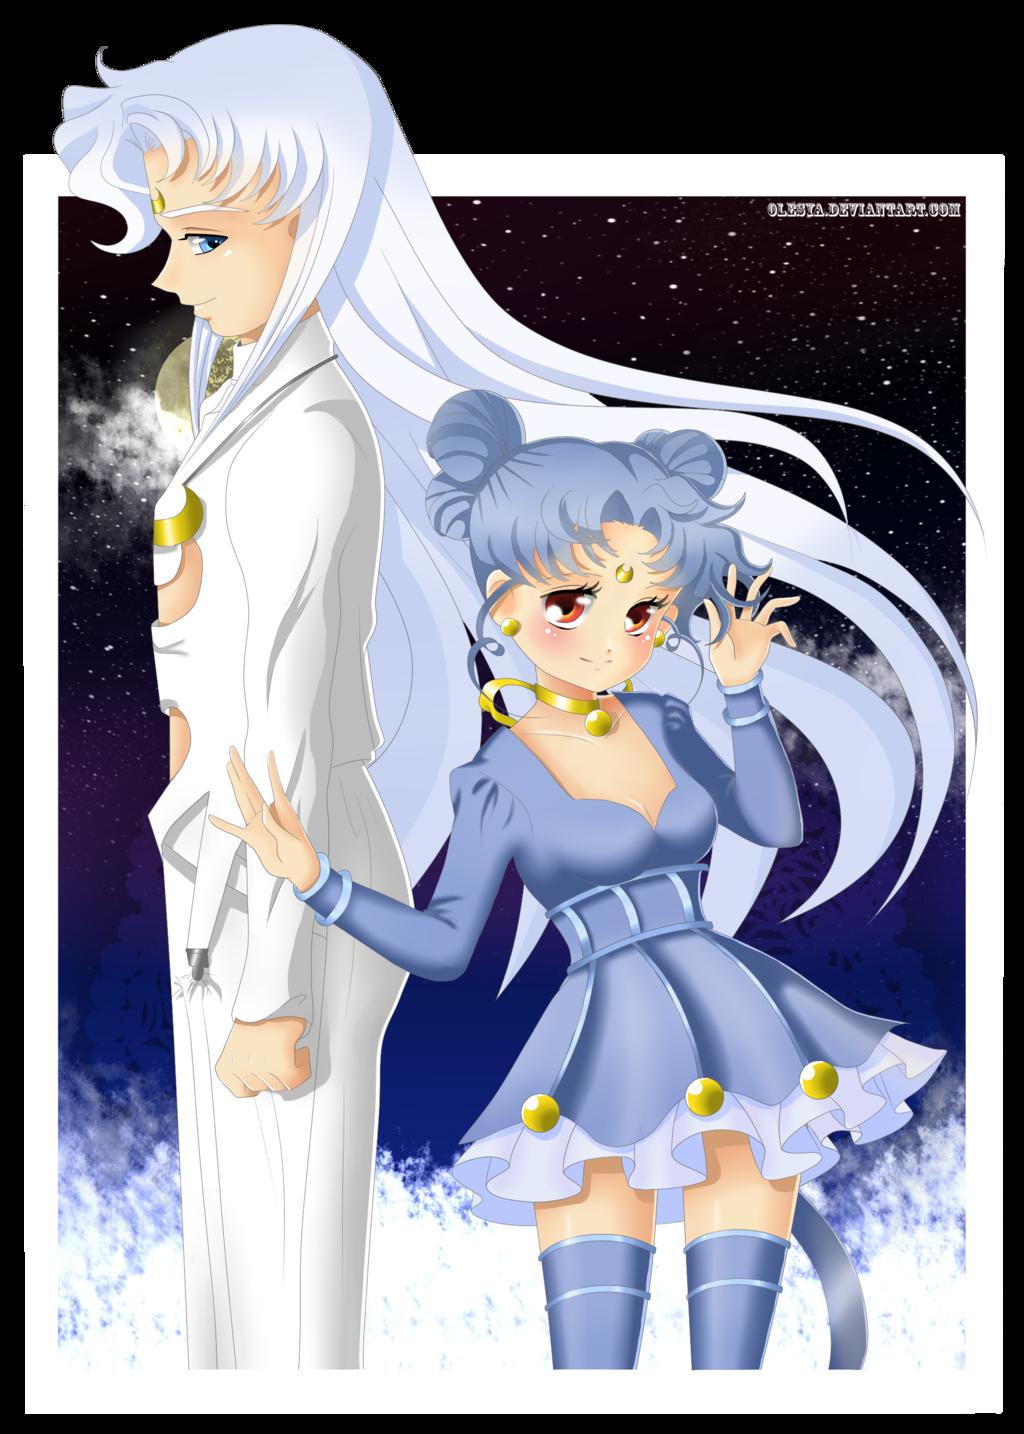 Human Artemis and Diana by 0lesya.deviantart.com on @deviantART ...